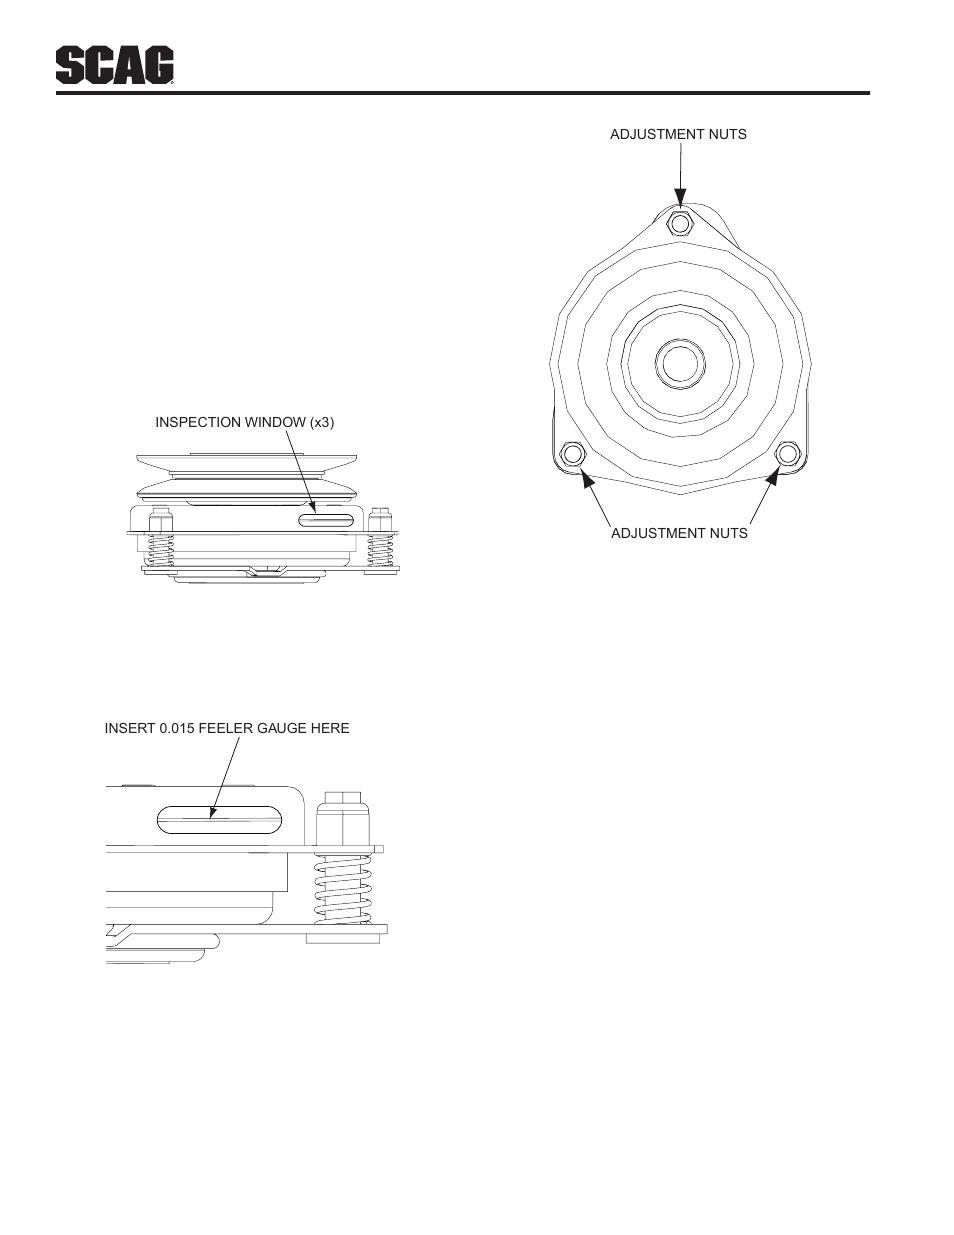 7 Electric Clutch Adjustment